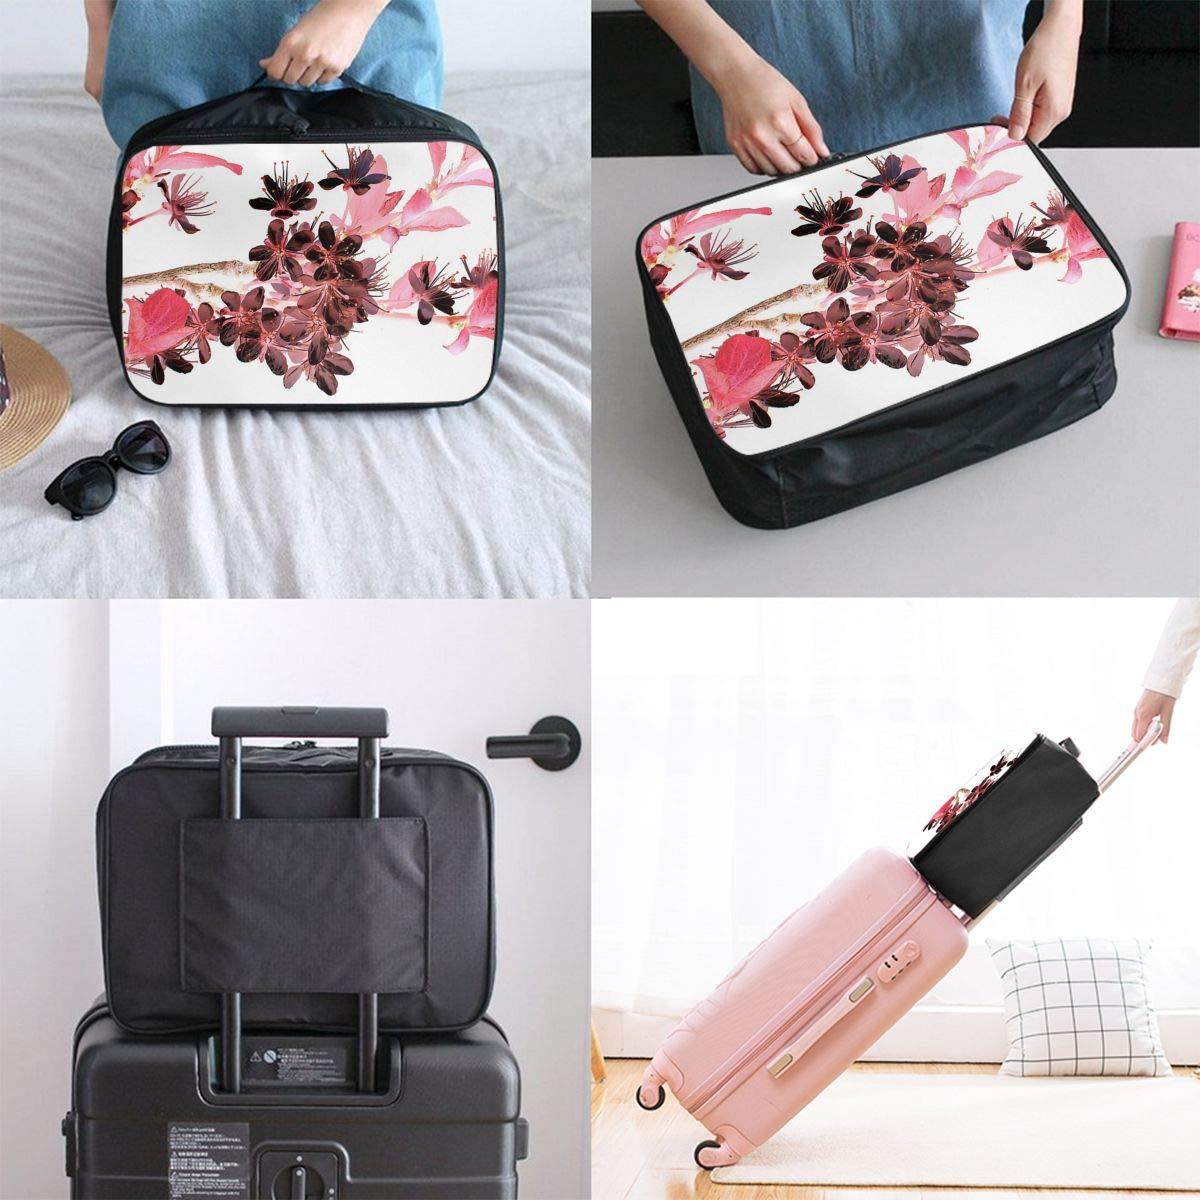 Travel Luggage Duffle Bag Lightweight Portable Handbag Pink Flowers Pattern Large Capacity Waterproof Foldable Storage Tote